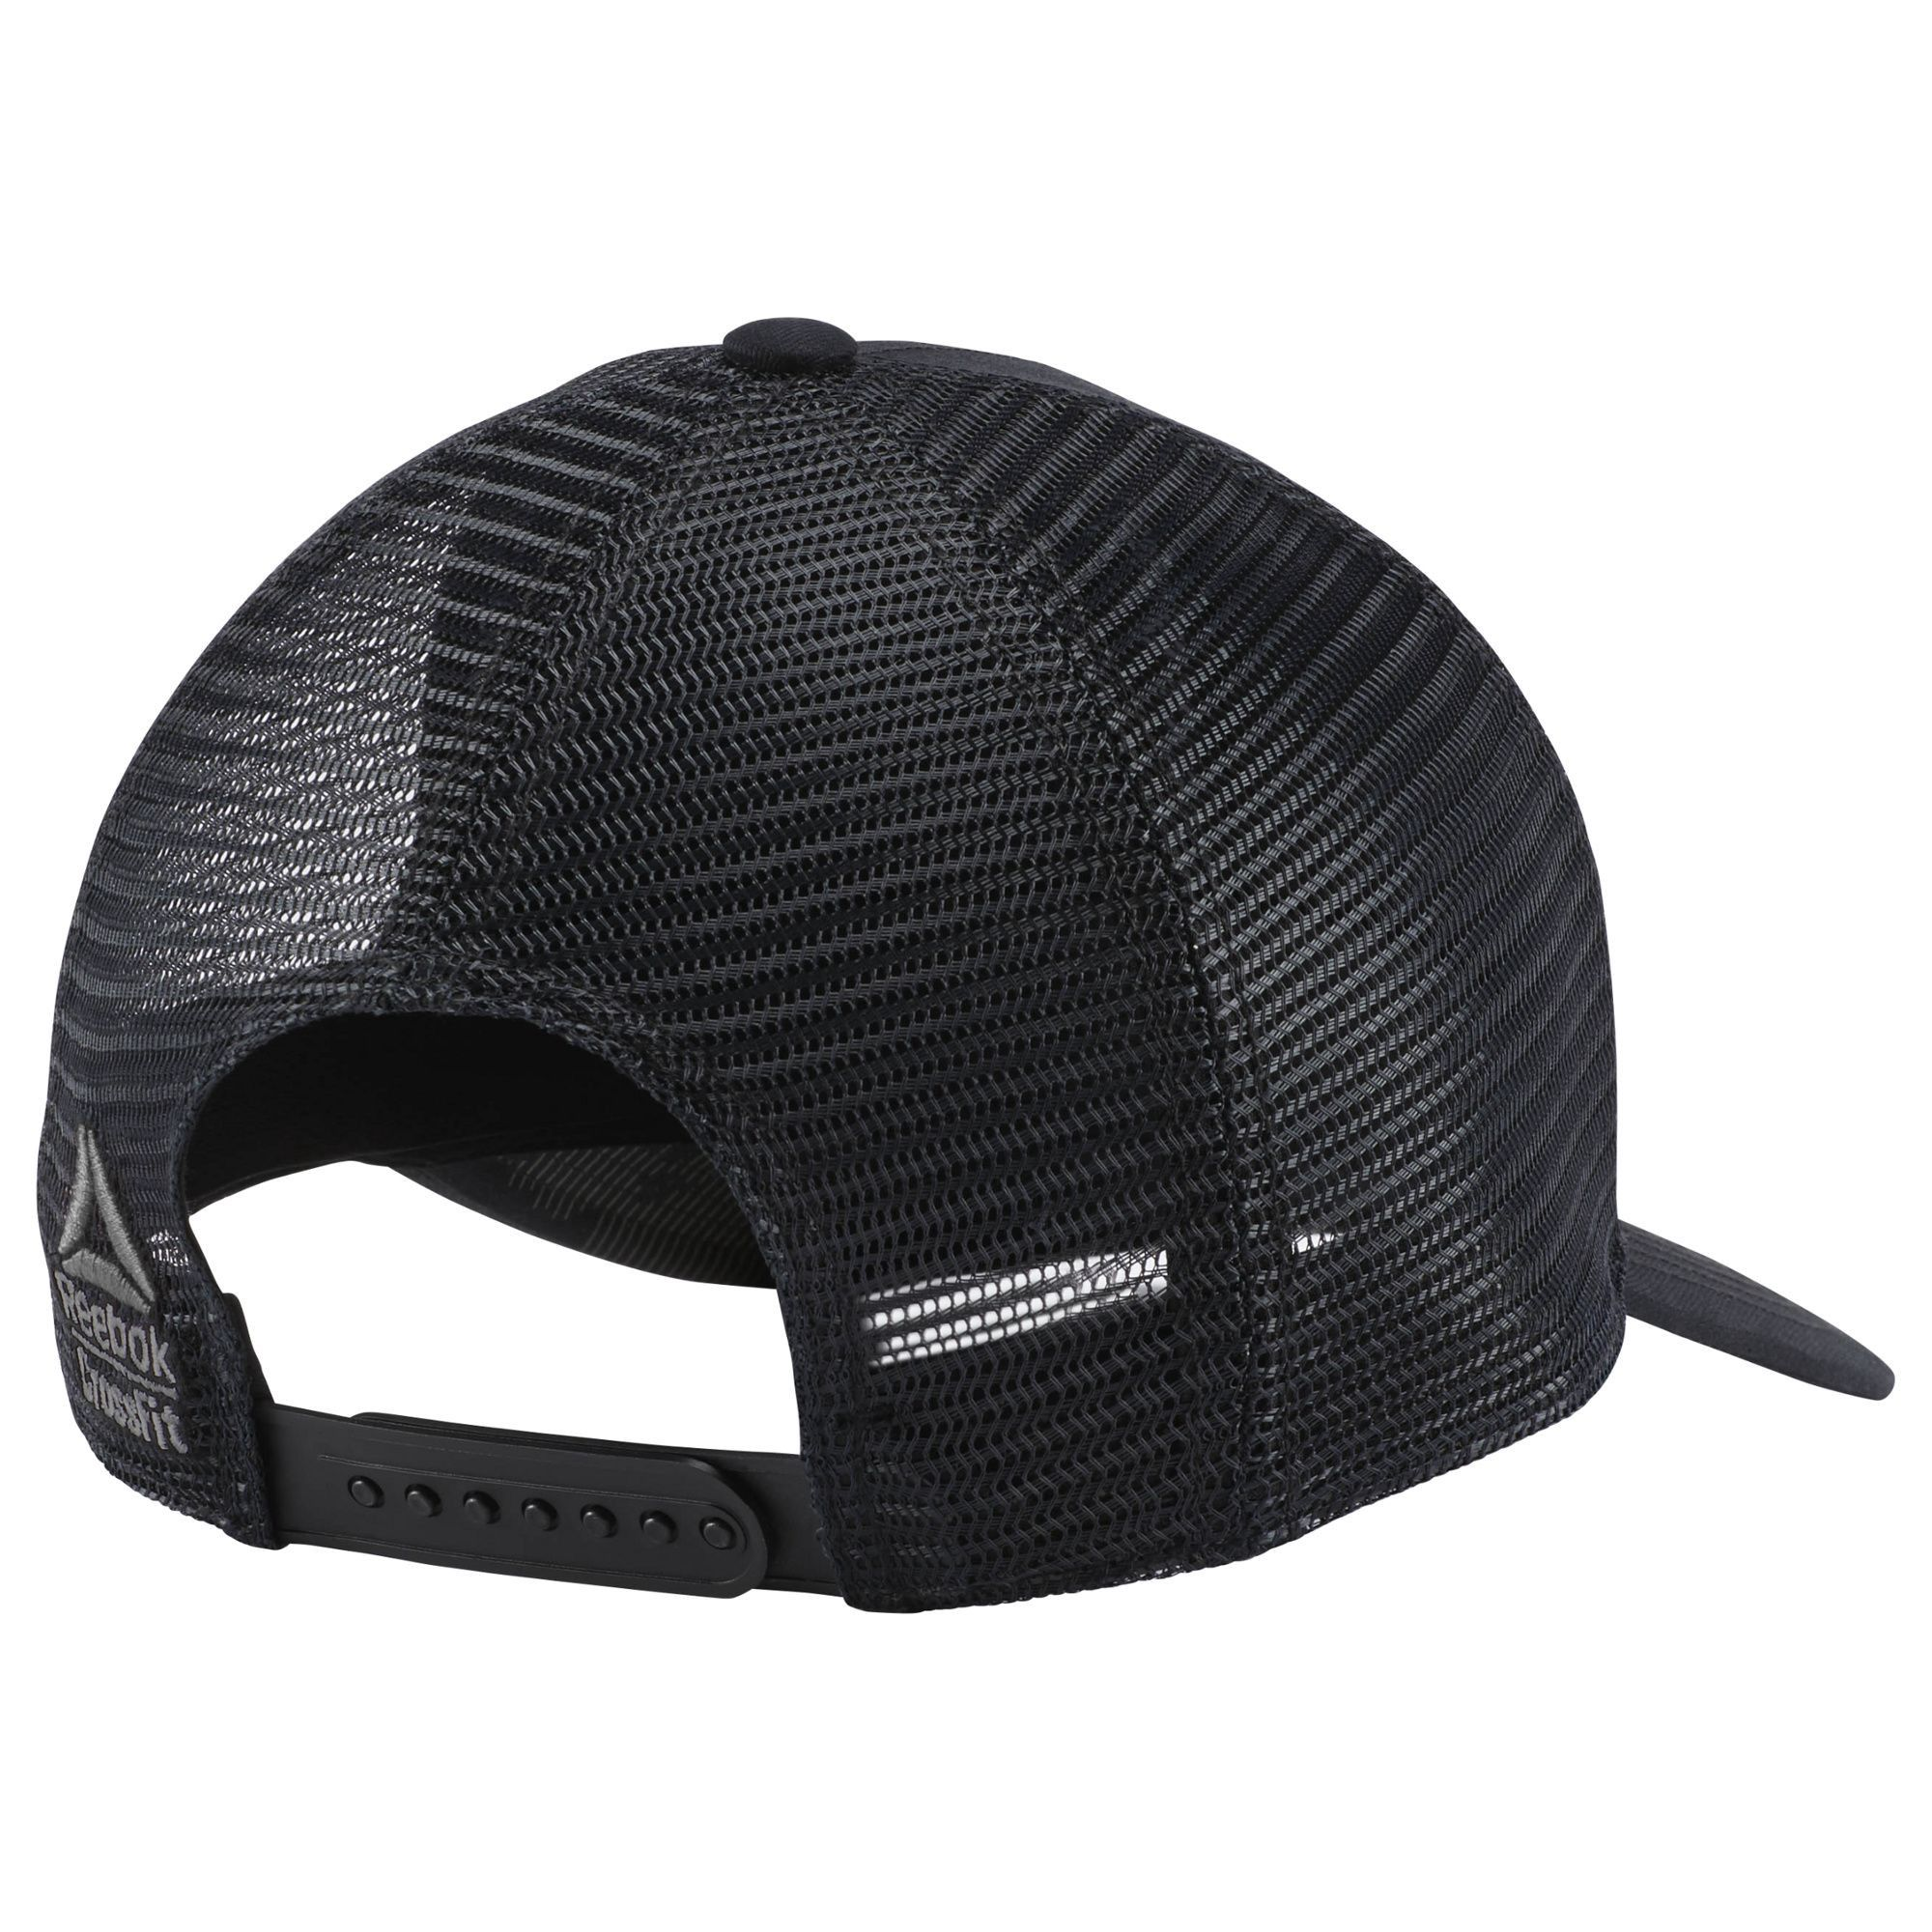 e2b23c742b2 Reebok Crossfit Lifestyle Cap - Black Osfm